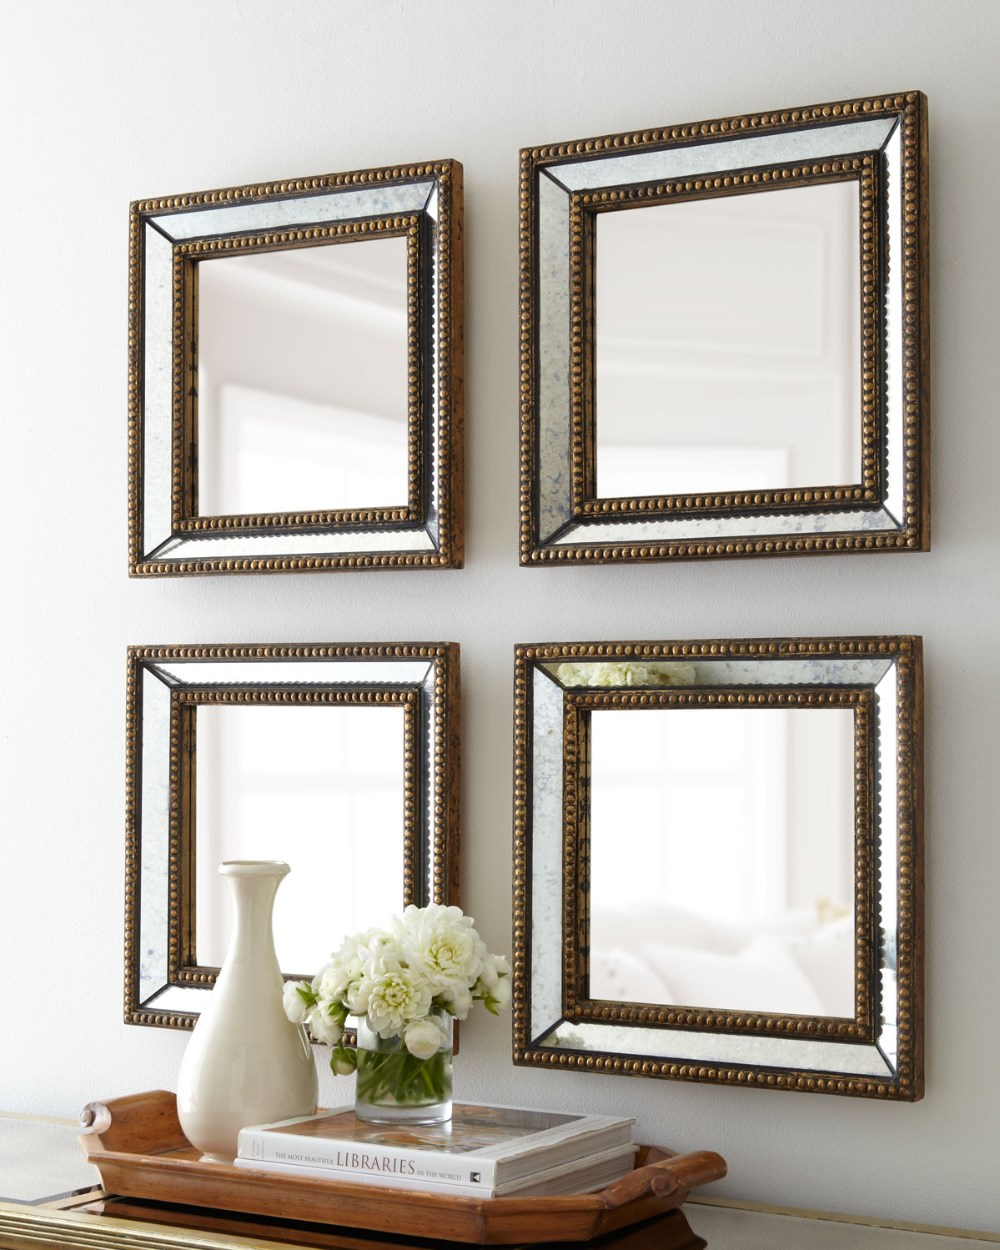 Beaded Square Home Decor Wall Mirror - Buy Mirror,Home Decor Mirror ...